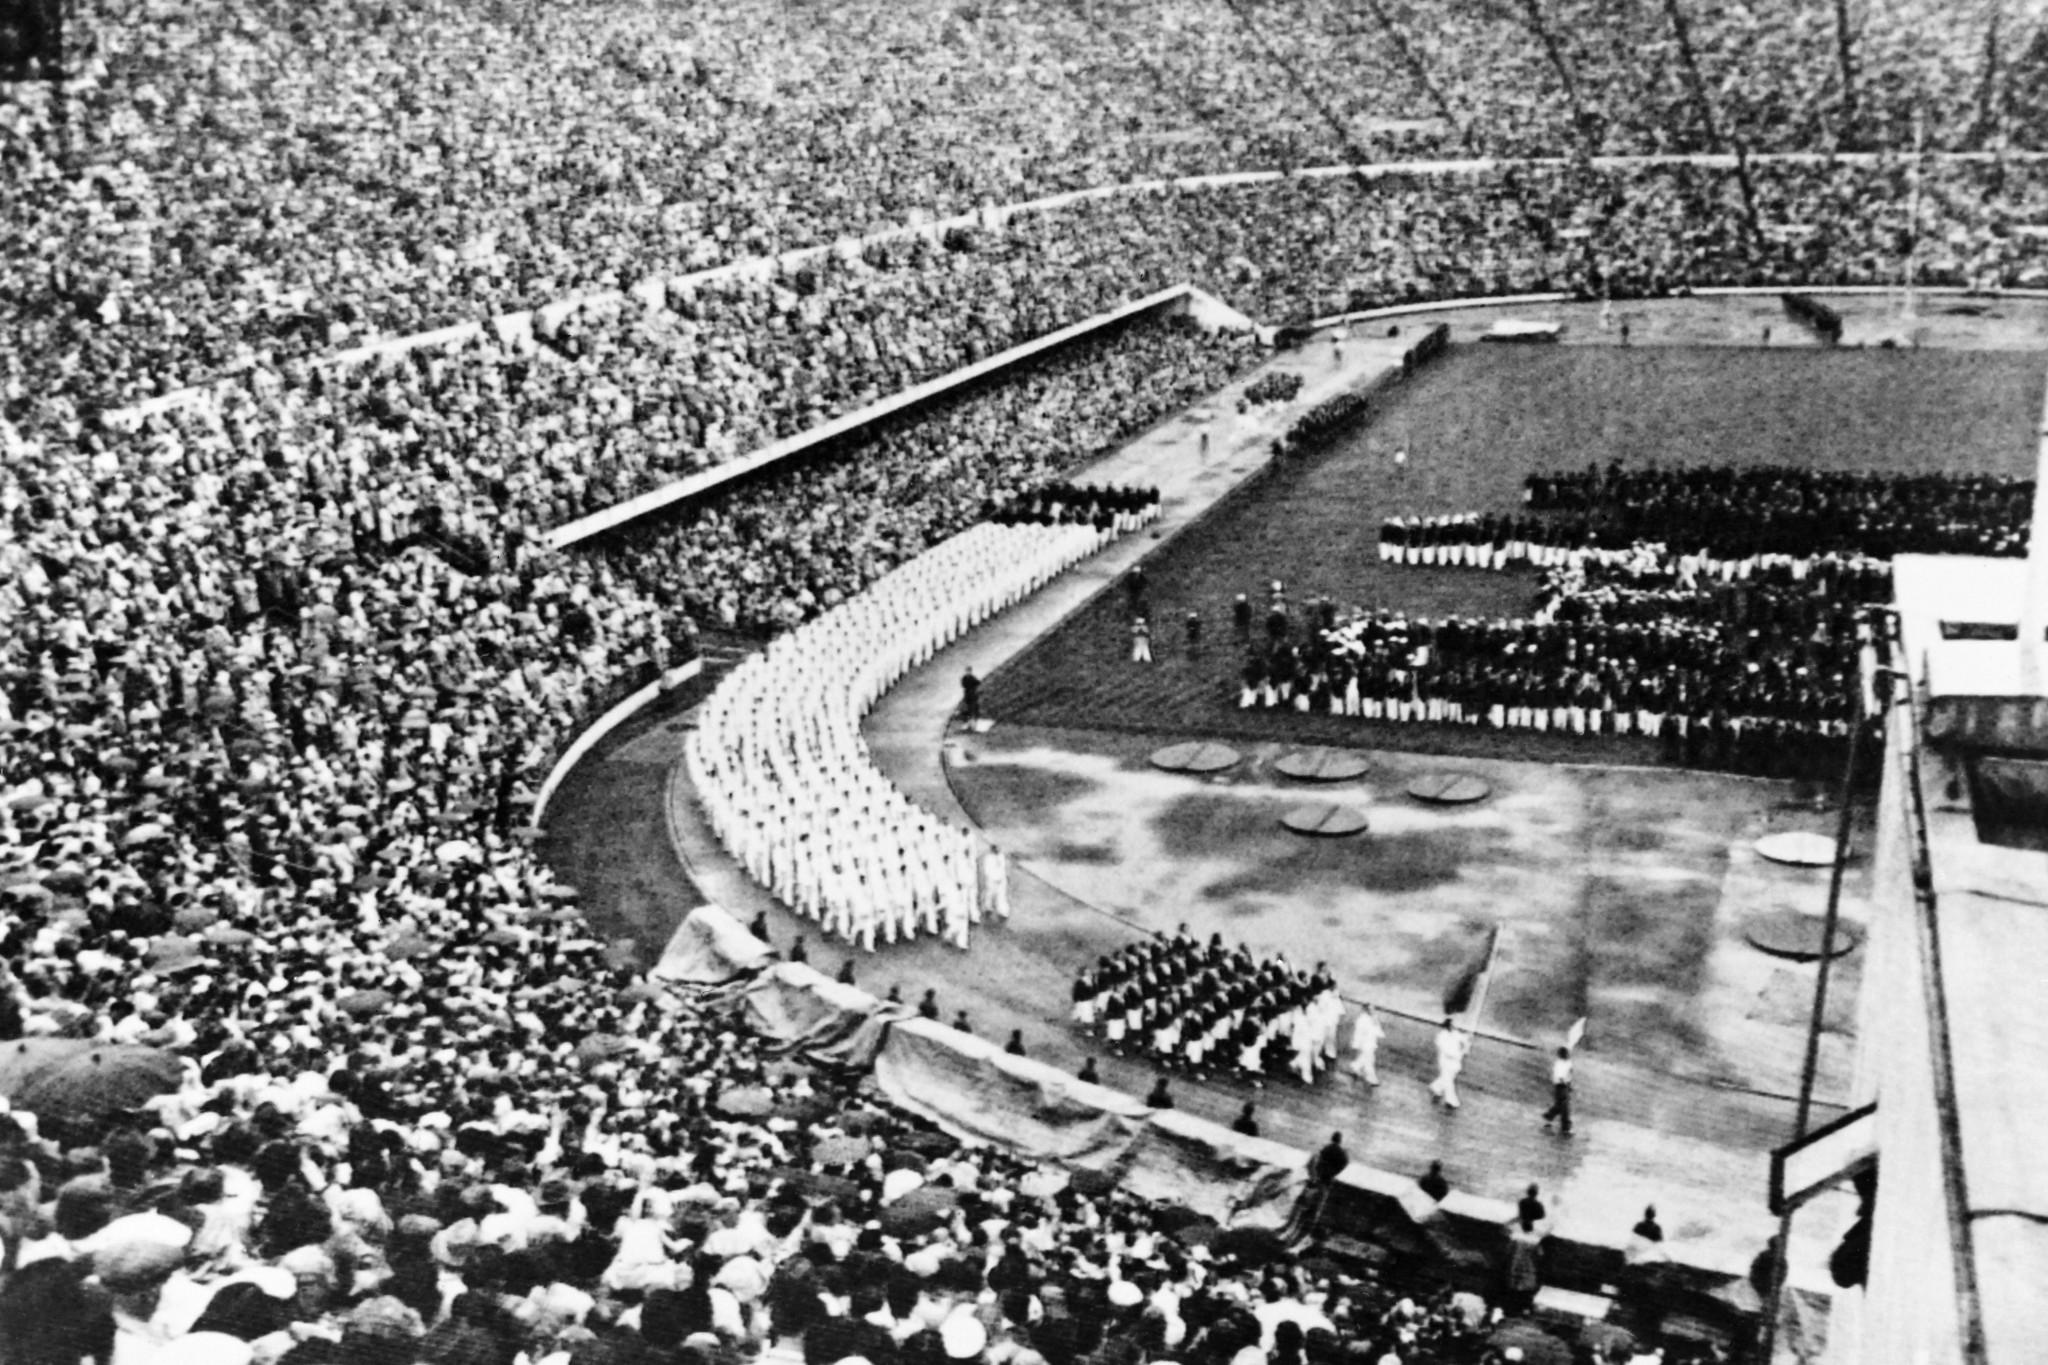 Leslie Laing won men's 4x400m relay gold at Helsinki 1952 ©Getty Images